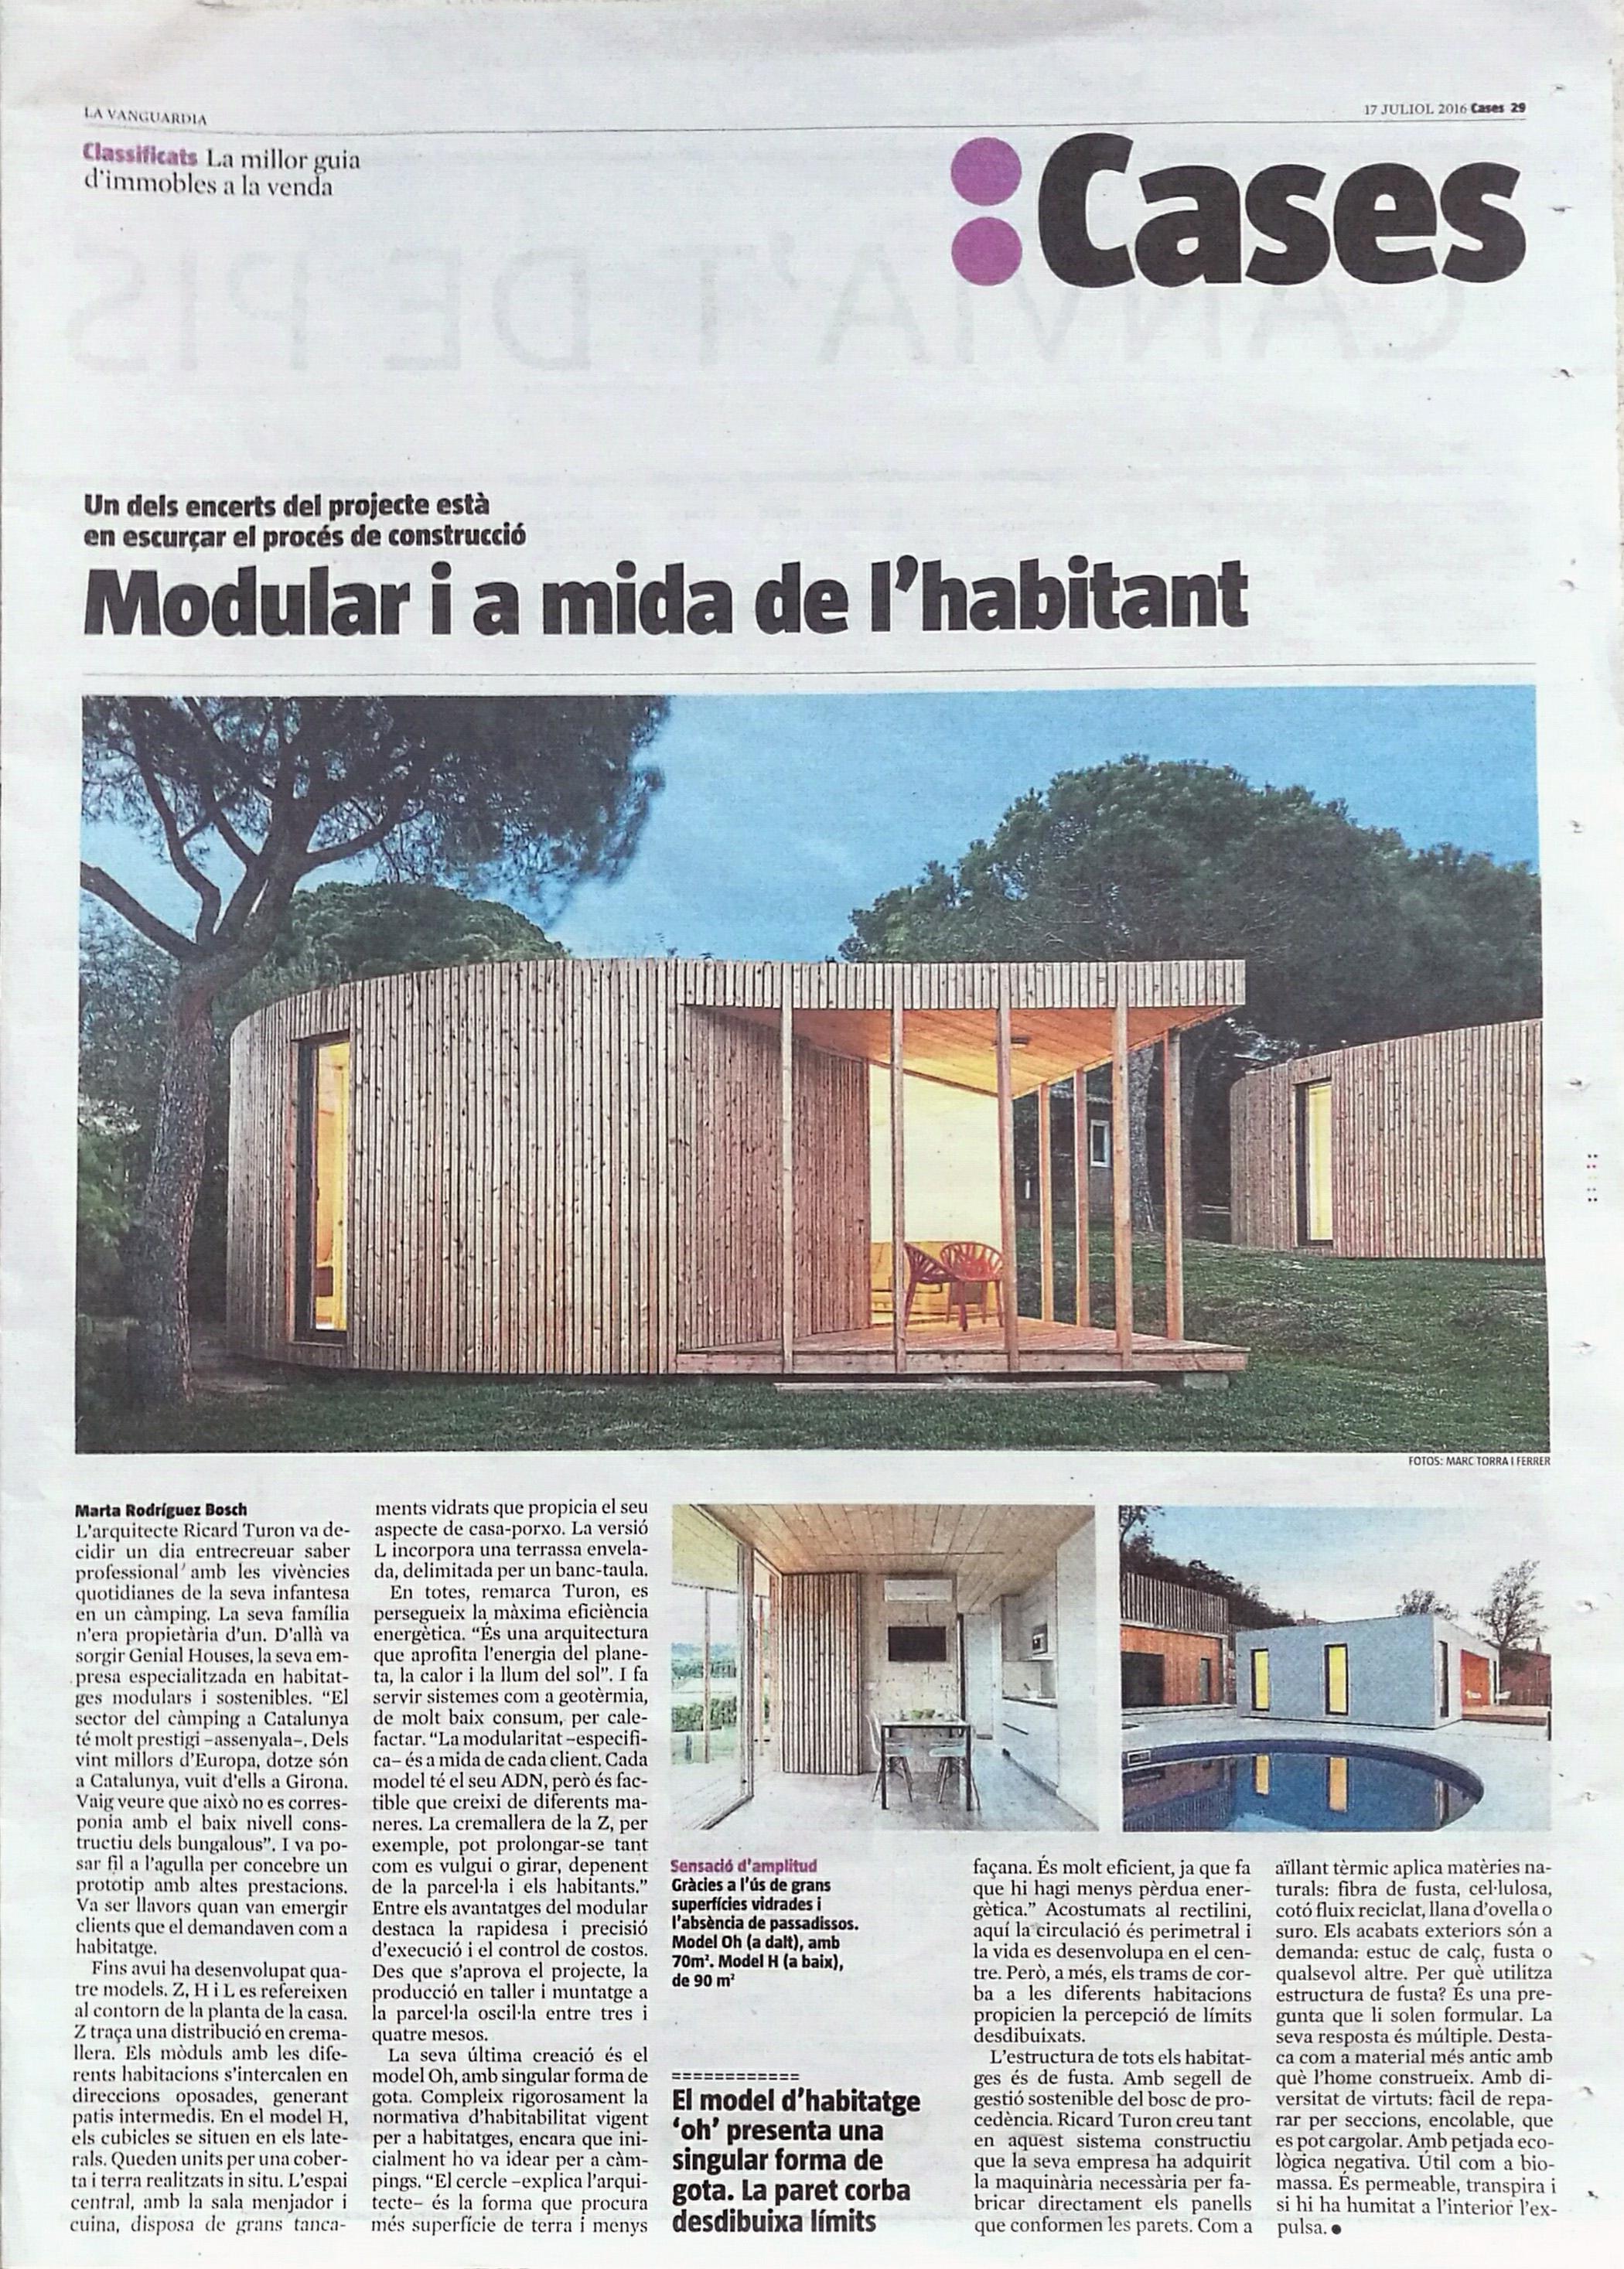 Genial Houses surt a La Vanguardia!